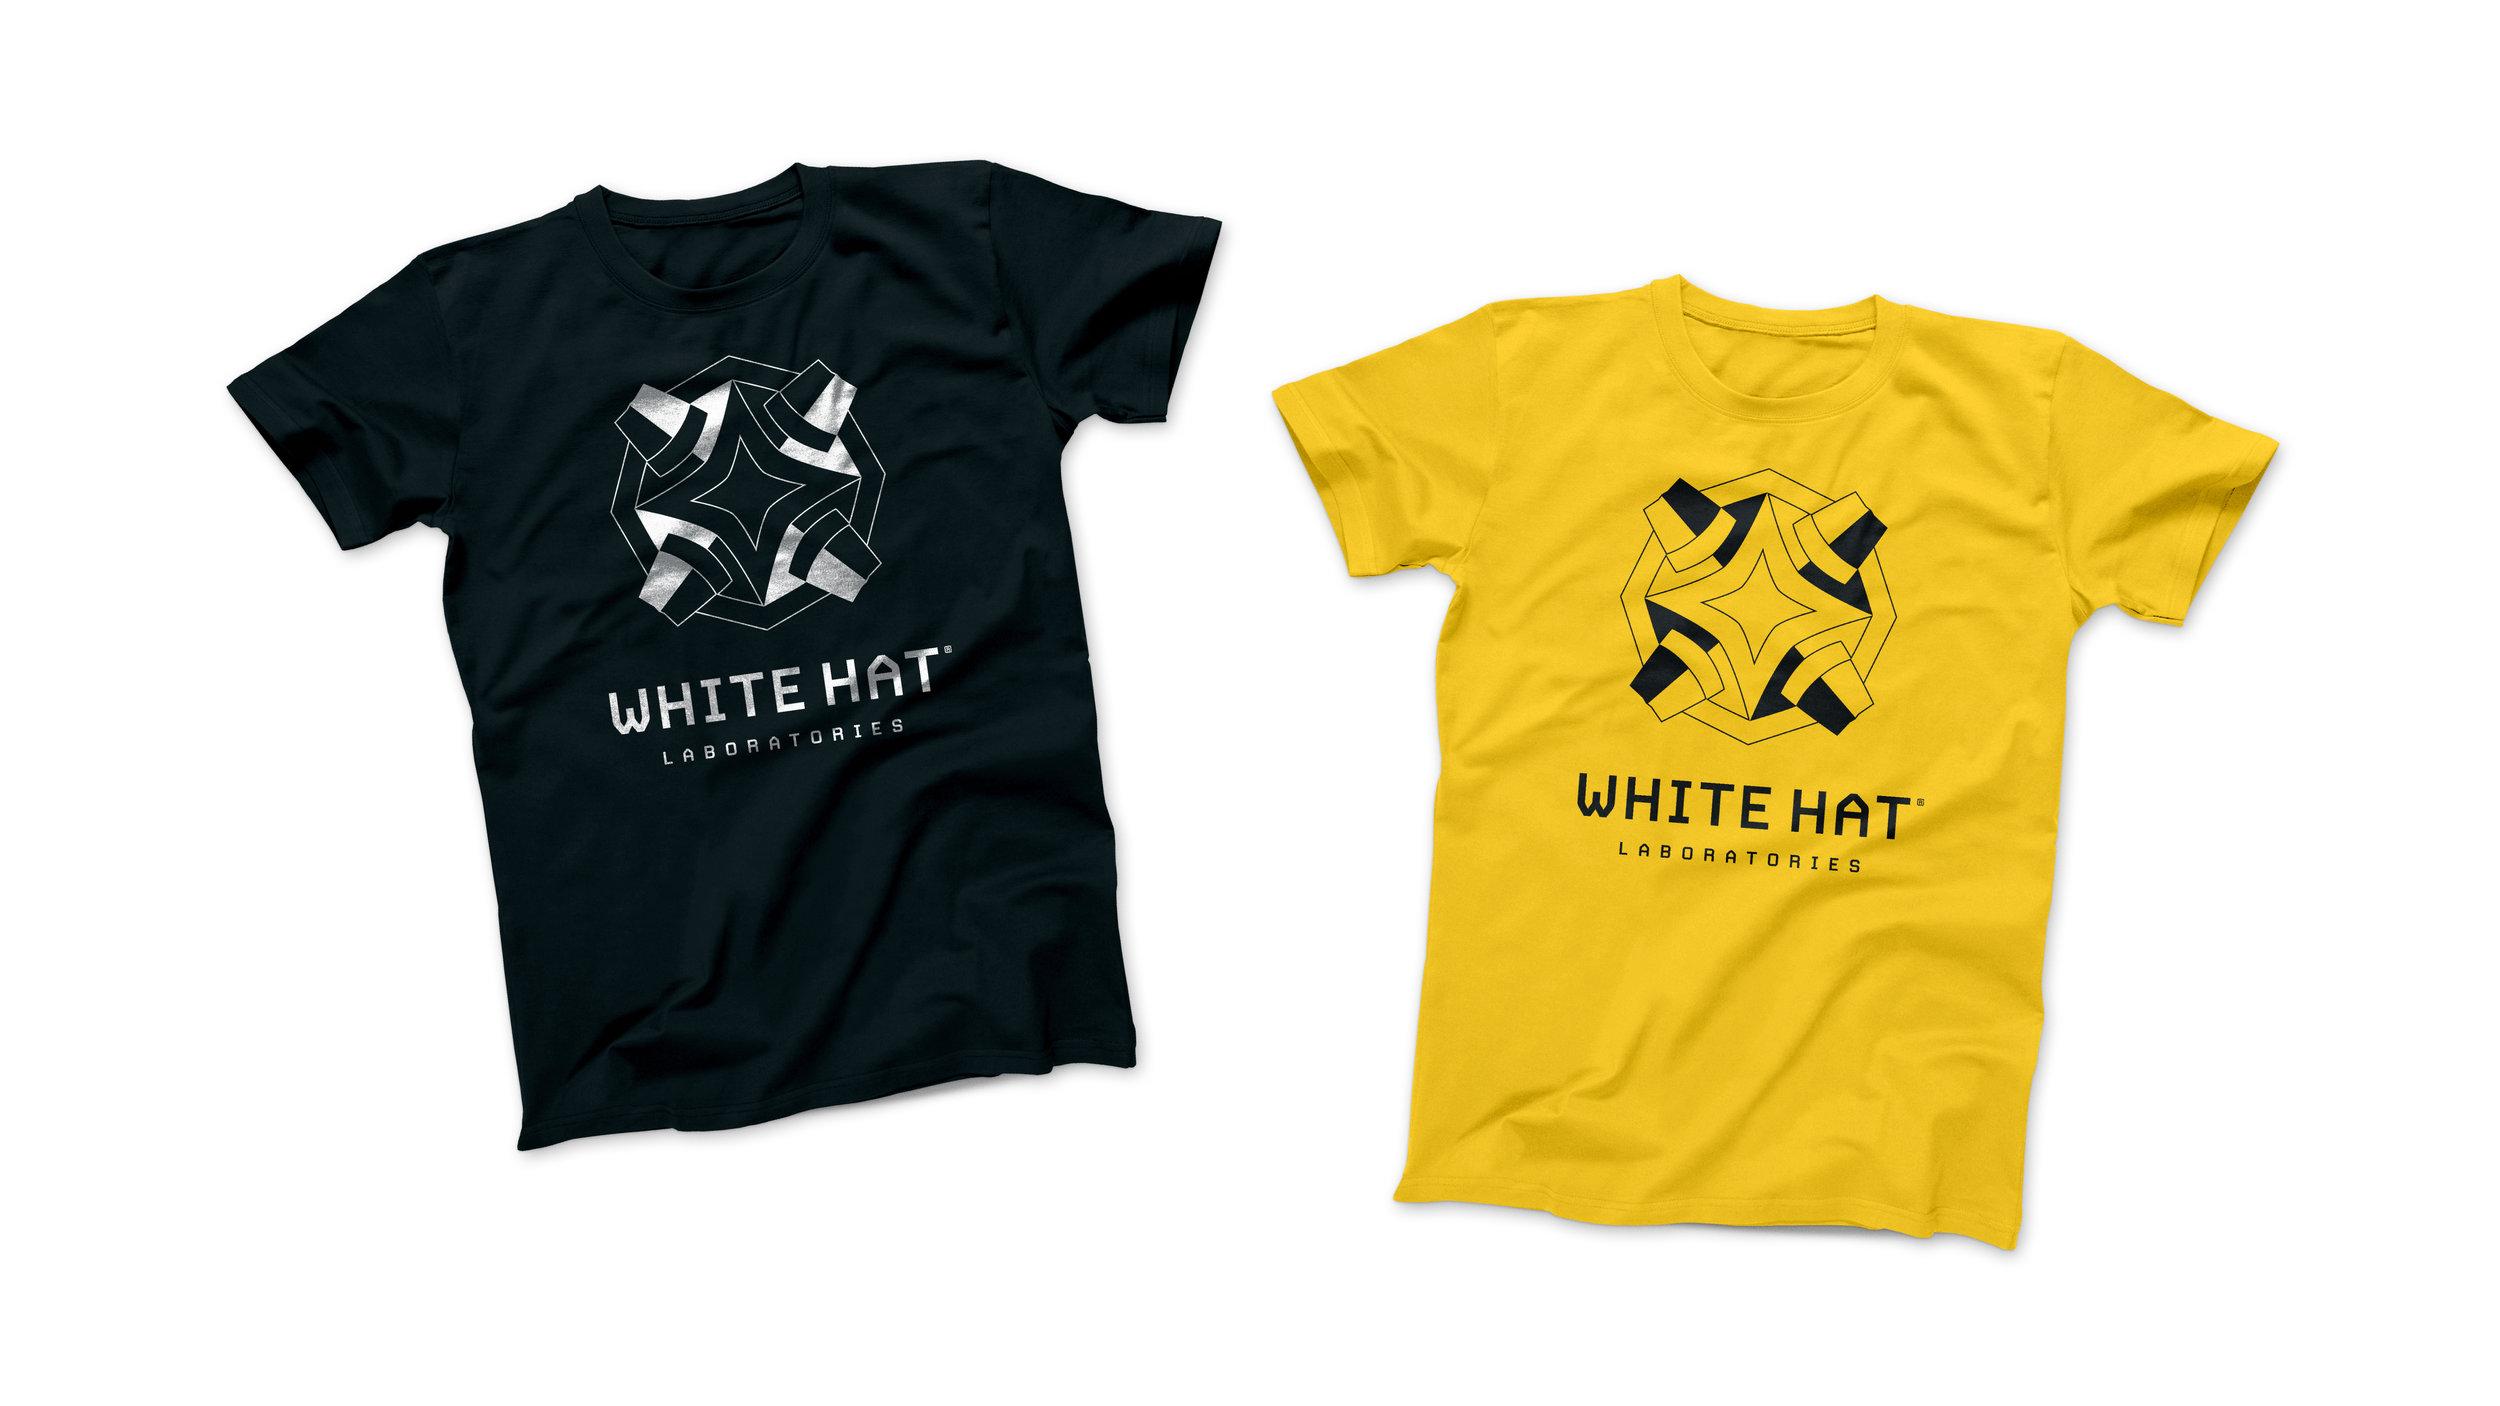 White Hat Laboratories T-Shirts